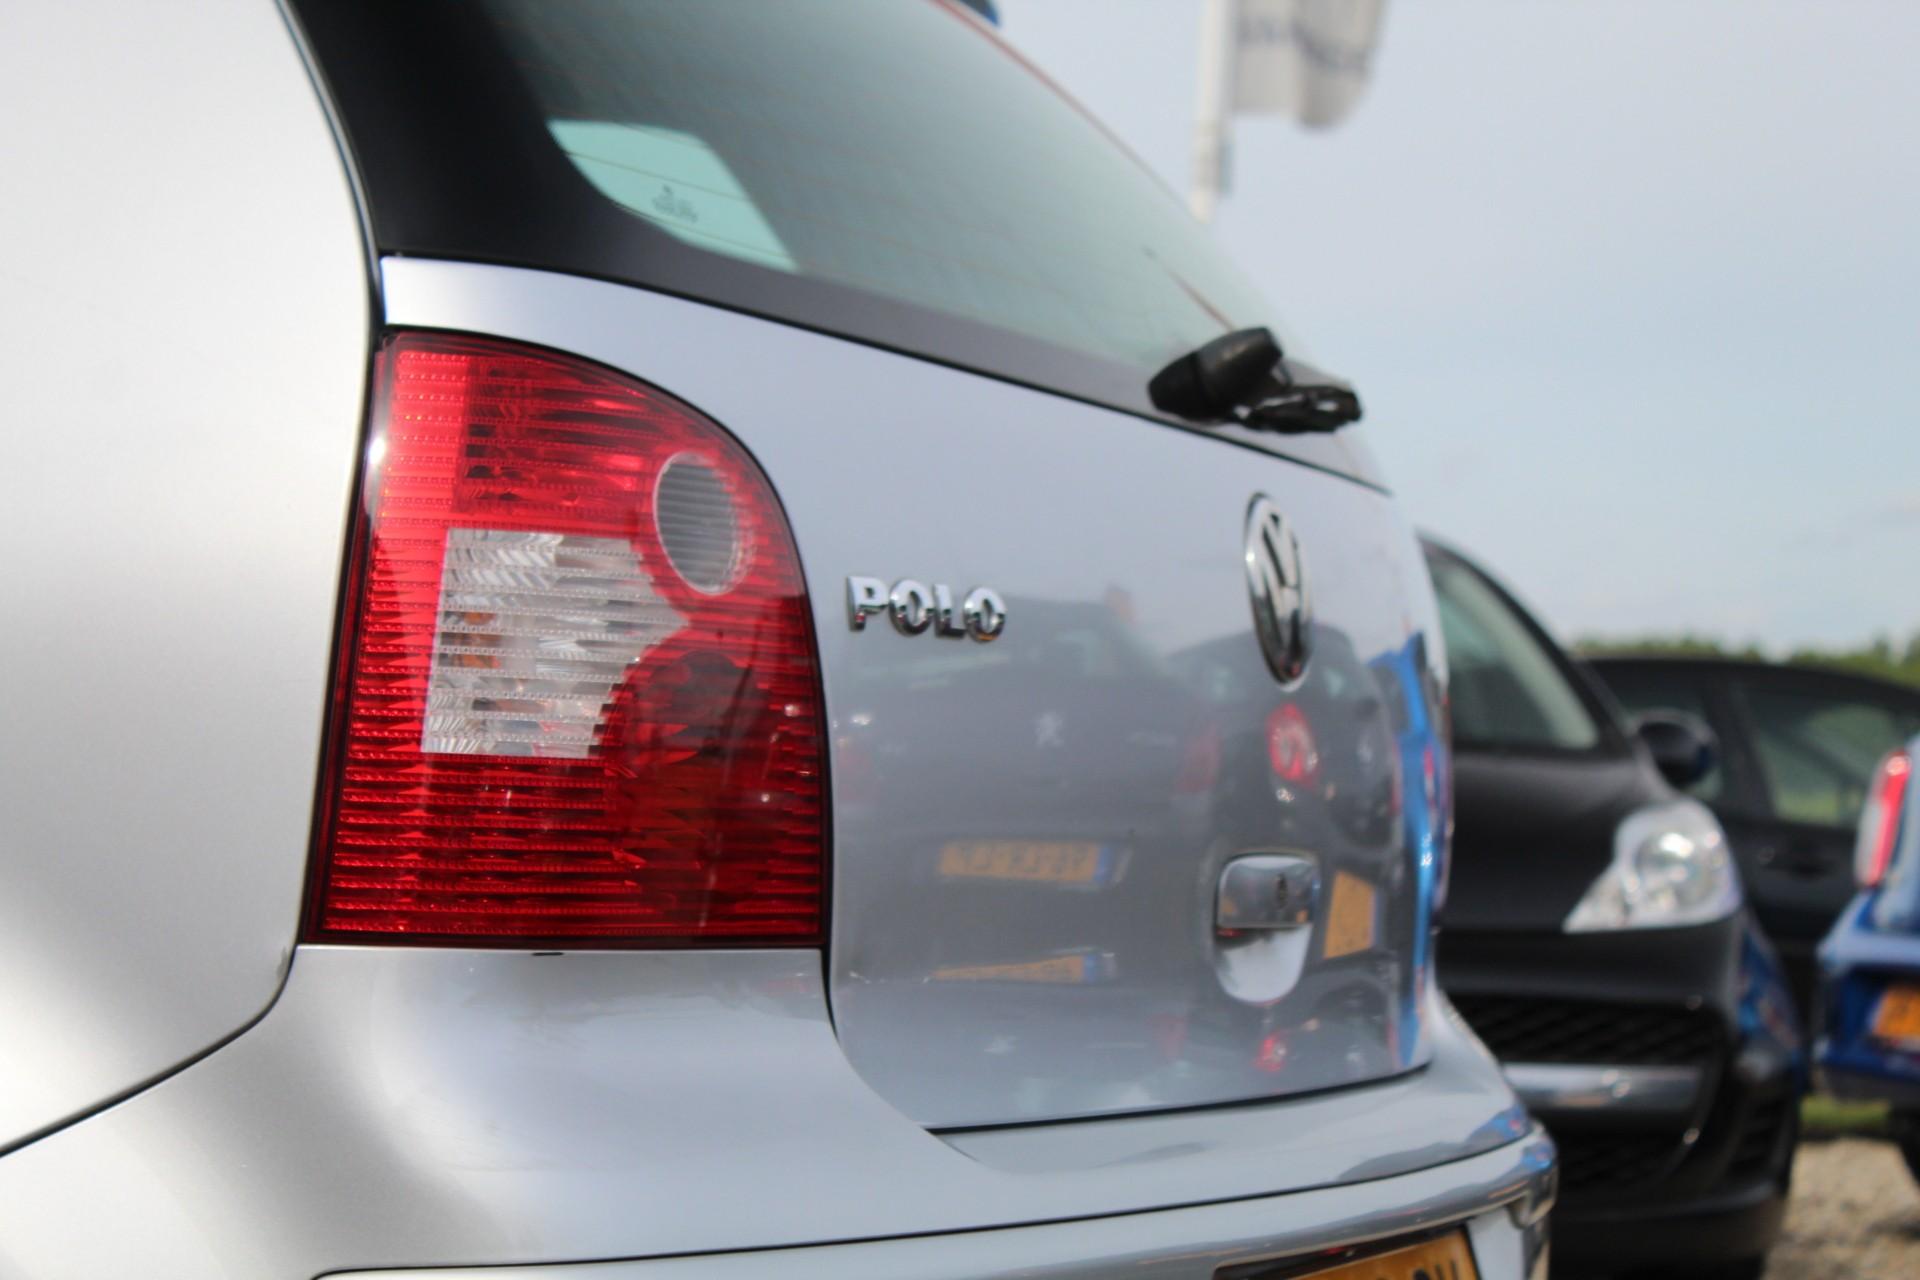 Caroutlet Groningen - Volkswagen Polo 1.2-12V | 2002 | APK 12-2019 | STUURBEKR |